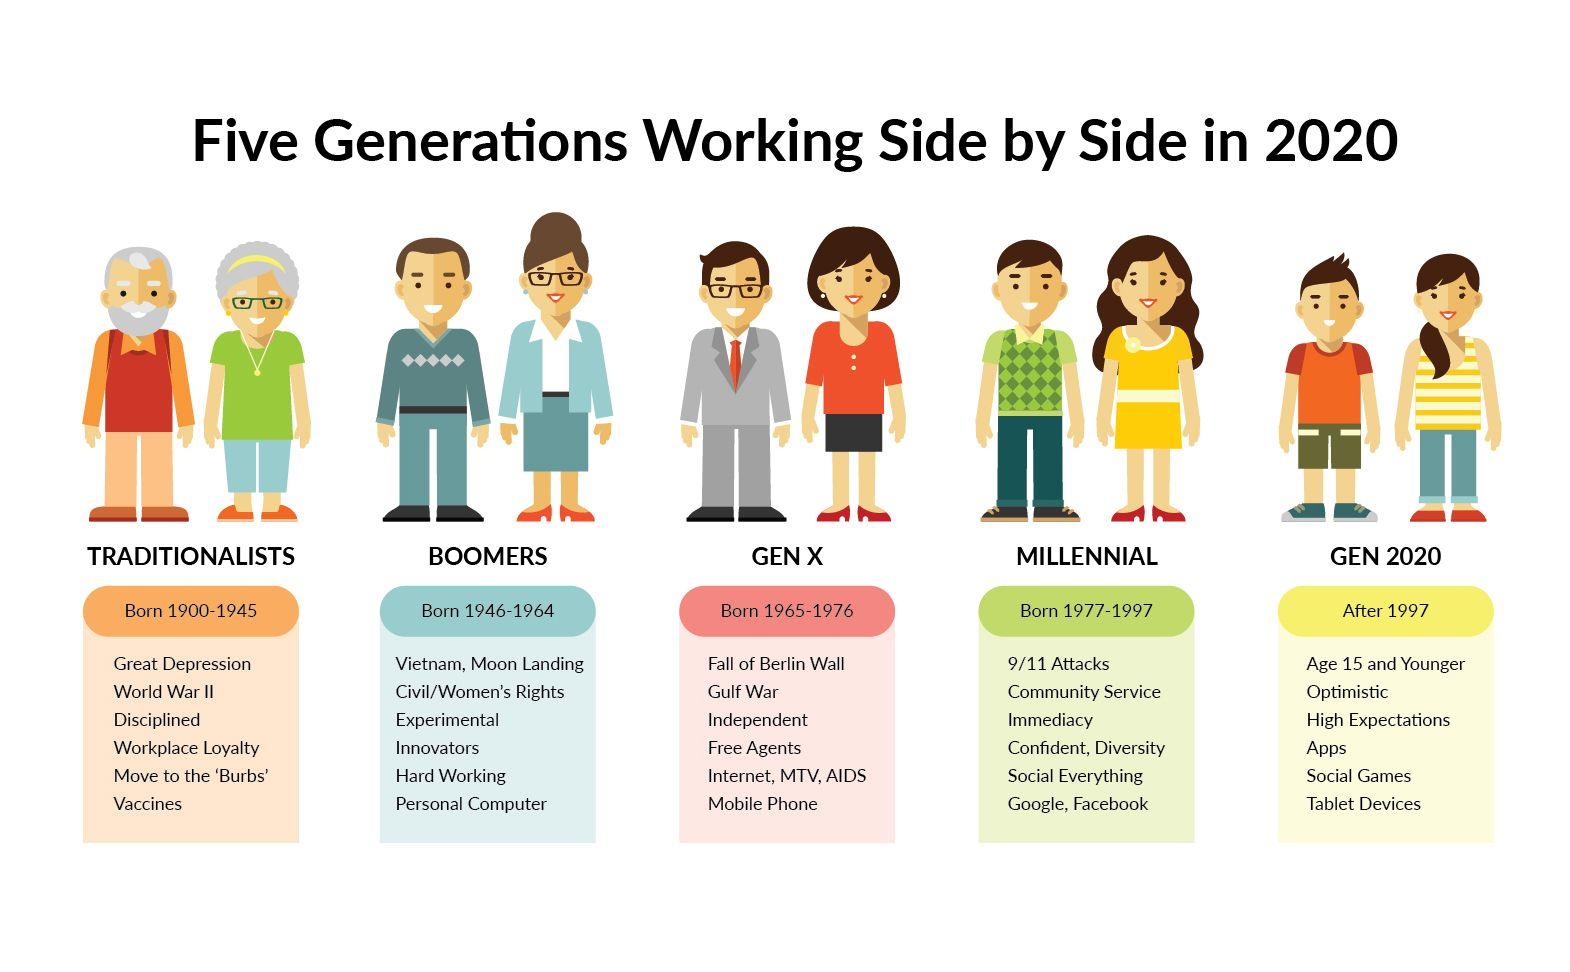 *Five generations working side by side in 2020 in 2020